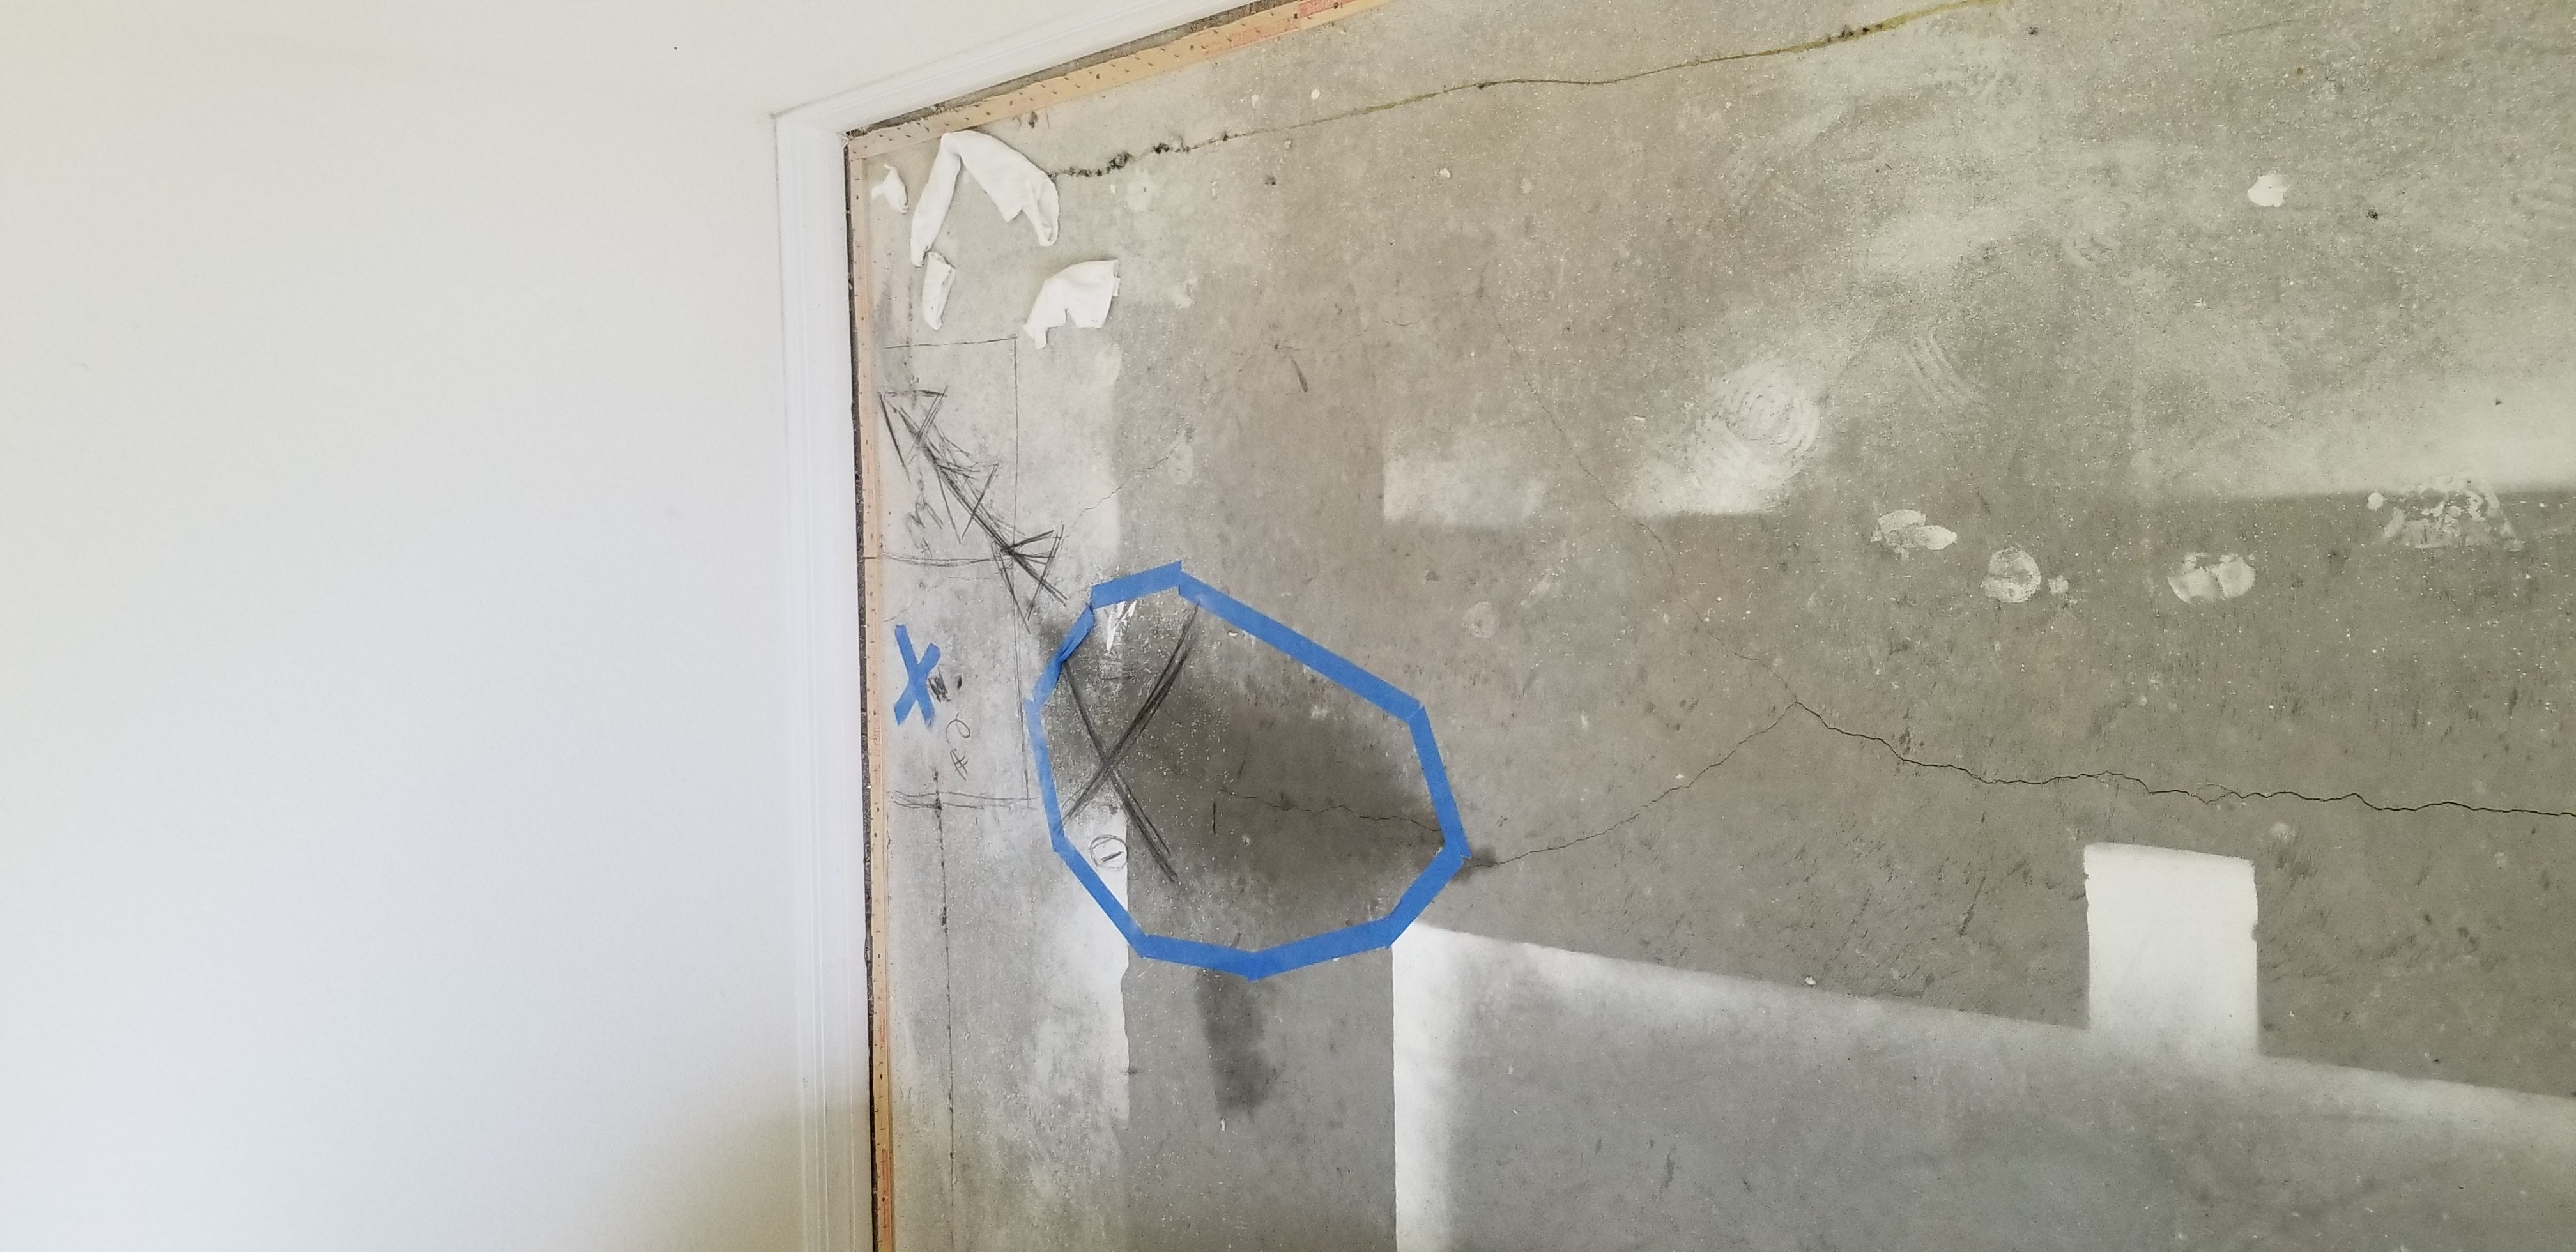 Slab leak detection